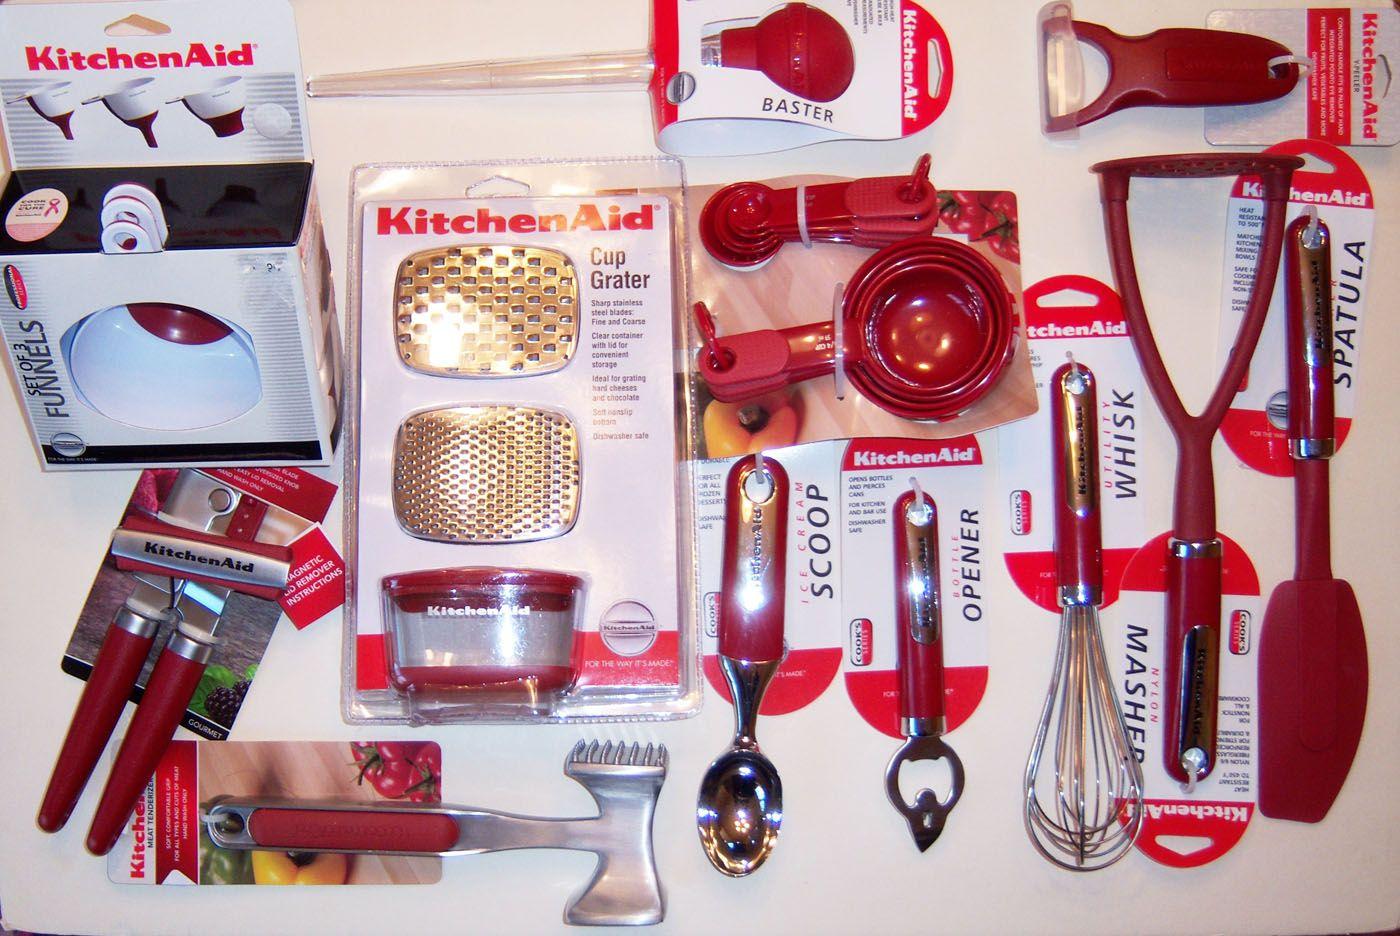 Kitchenaid empire red kitchen utensils linens choice of